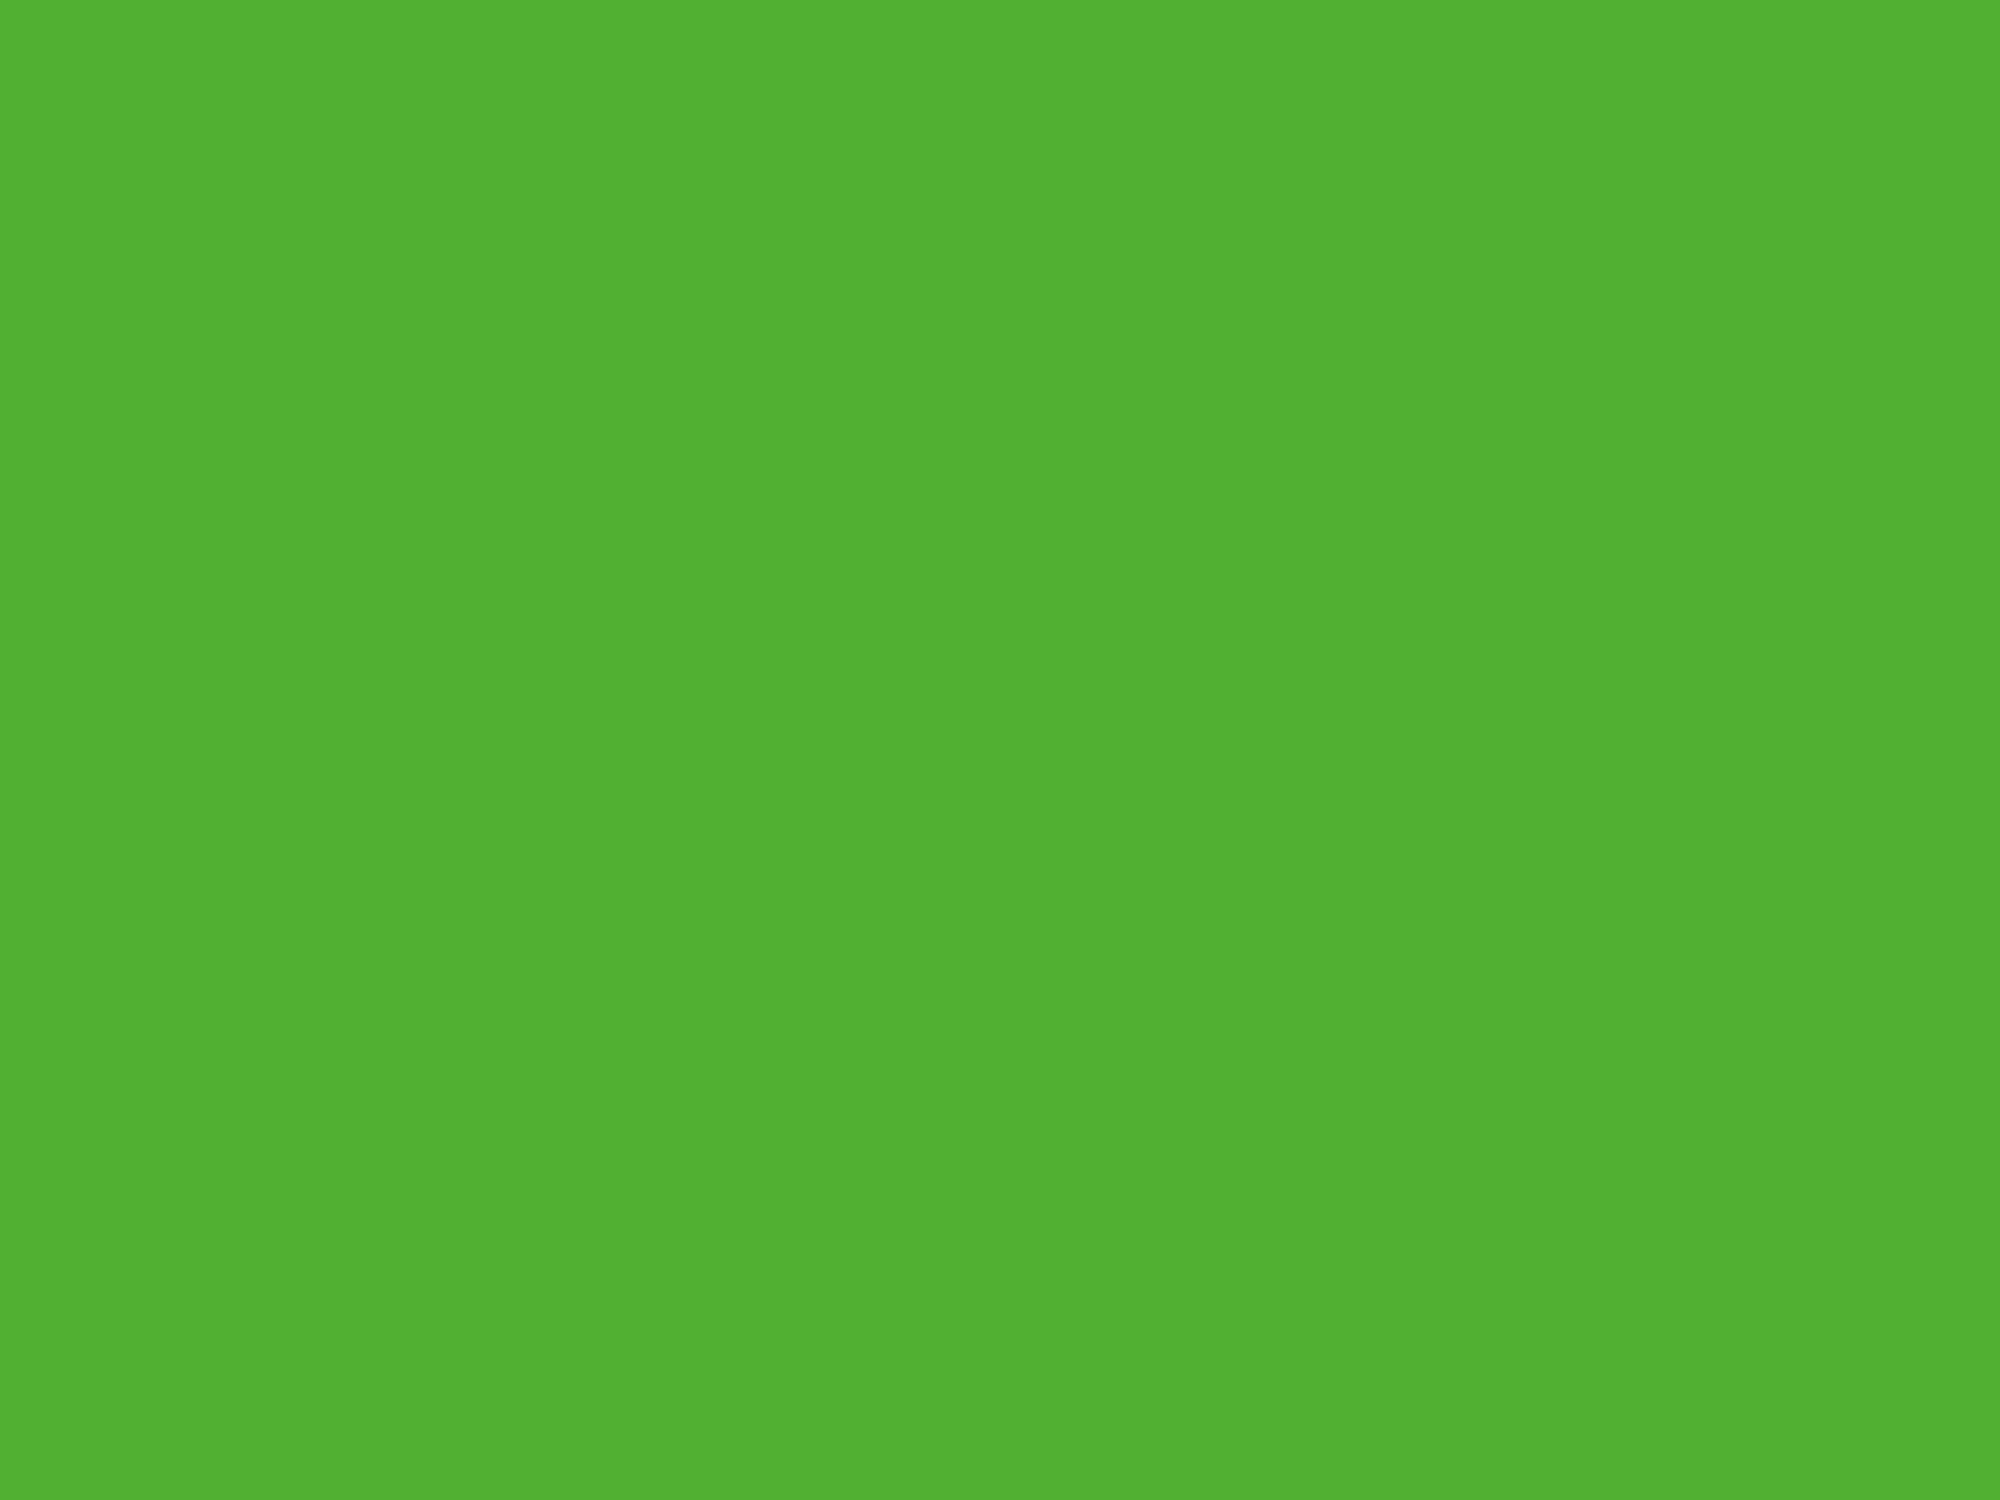 Groen vlak